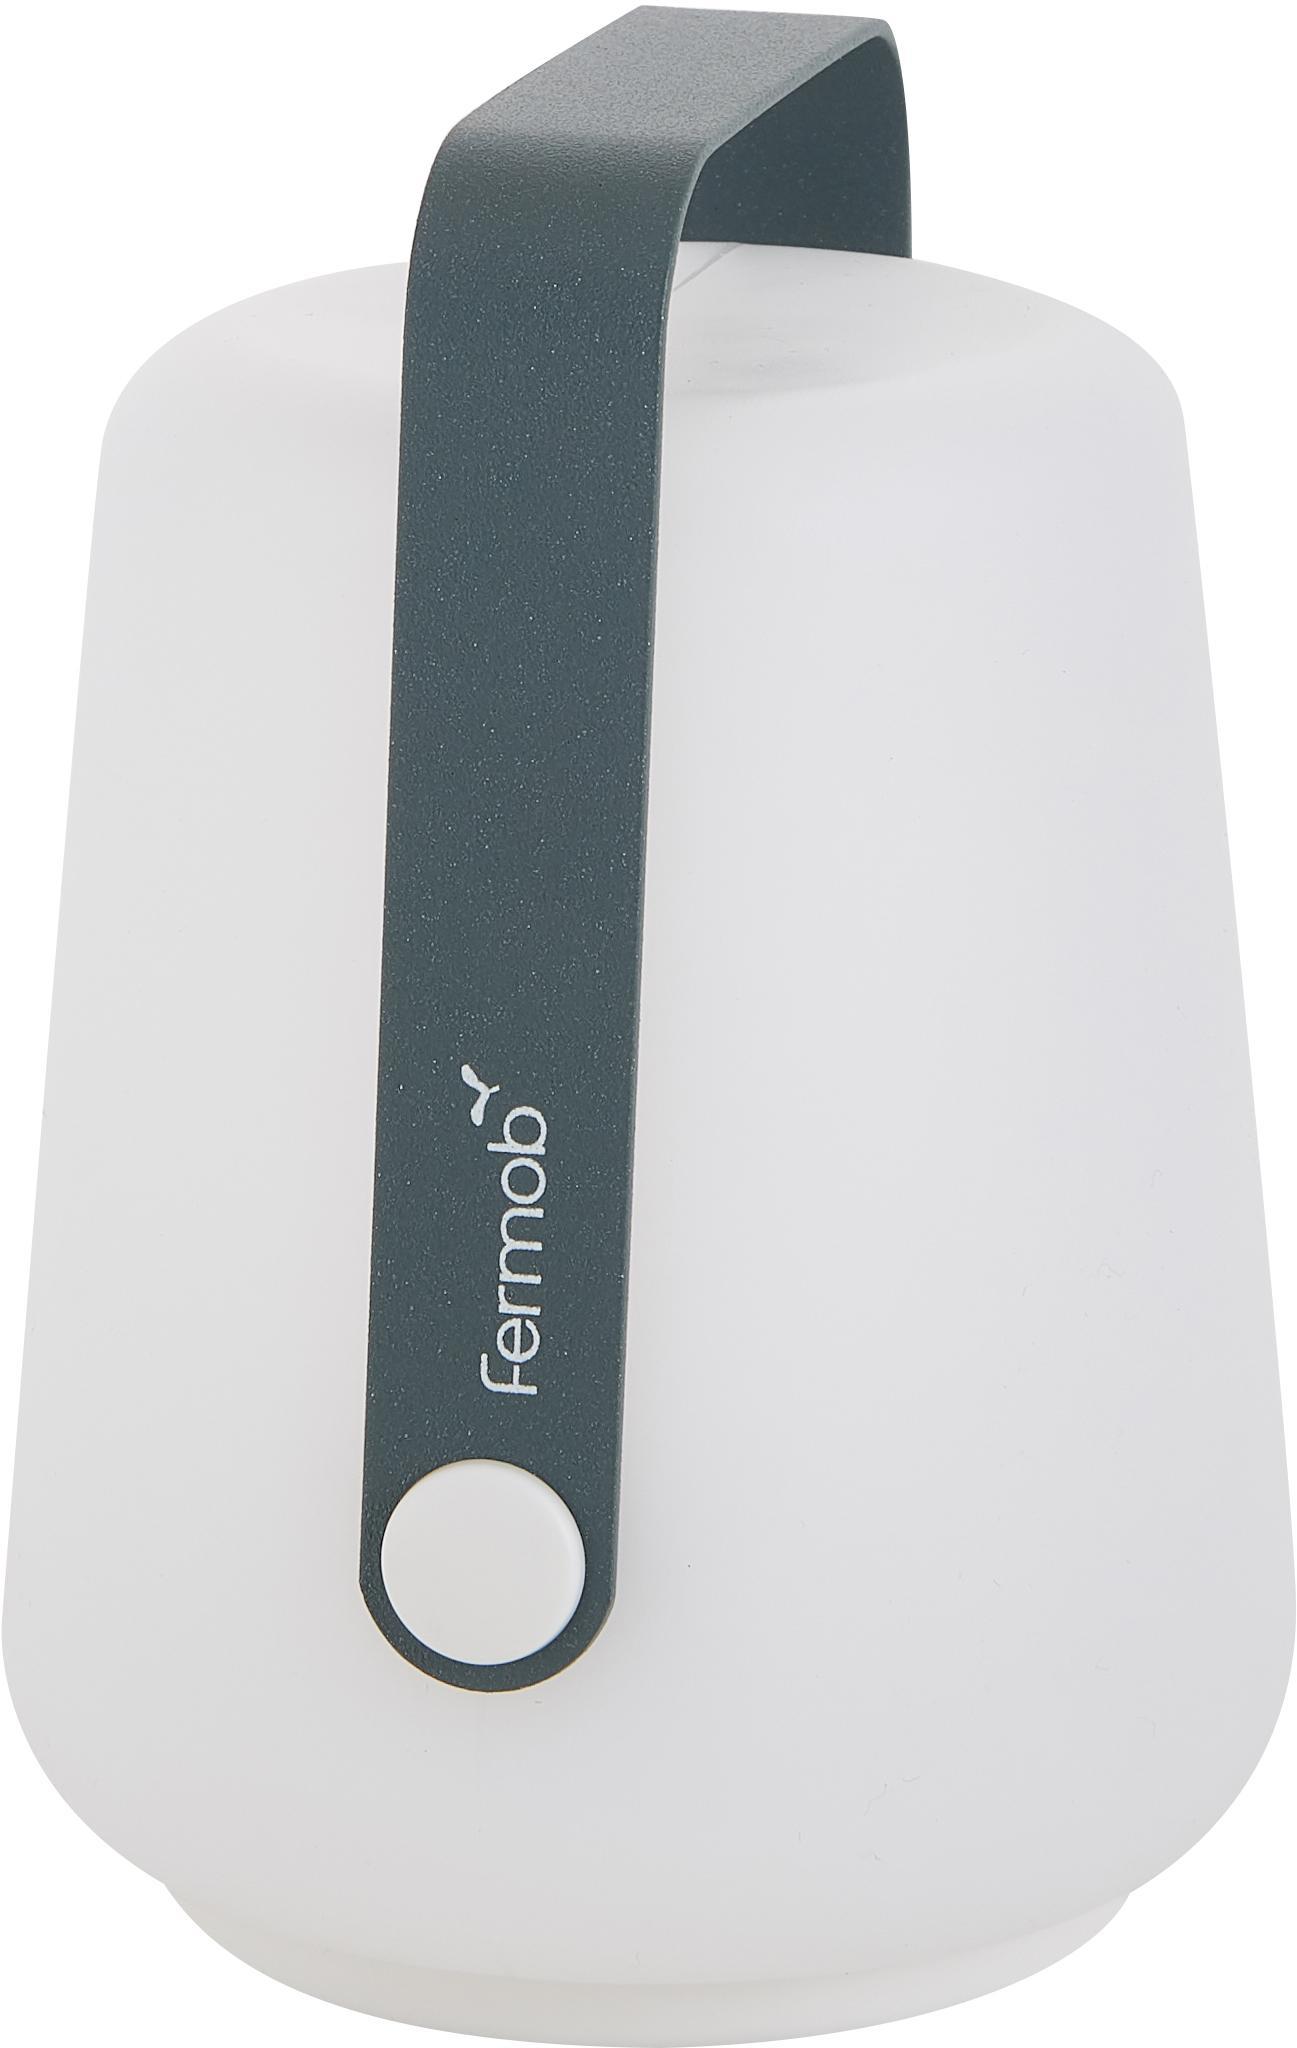 Lampada portatile a LED da esterno Balad 3 pz, Paralume: polietilene, Manico: alluminio verniciato, Grigio tempesta, Ø 10 x Alt. 13 cm